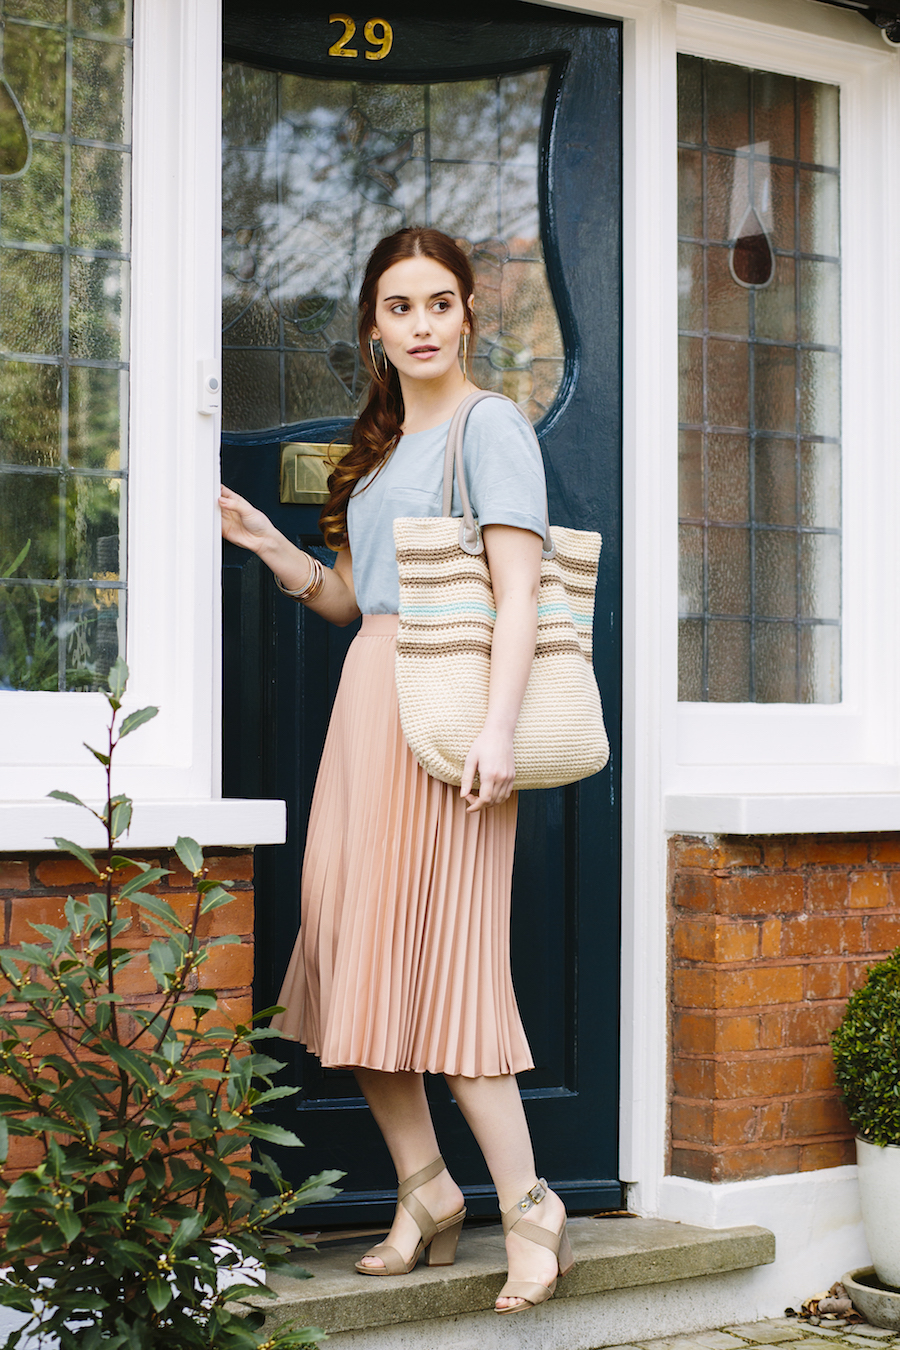 Crochet magazine / Model EmilyM / Uploaded 2nd May 2017 @ 06:11 PM